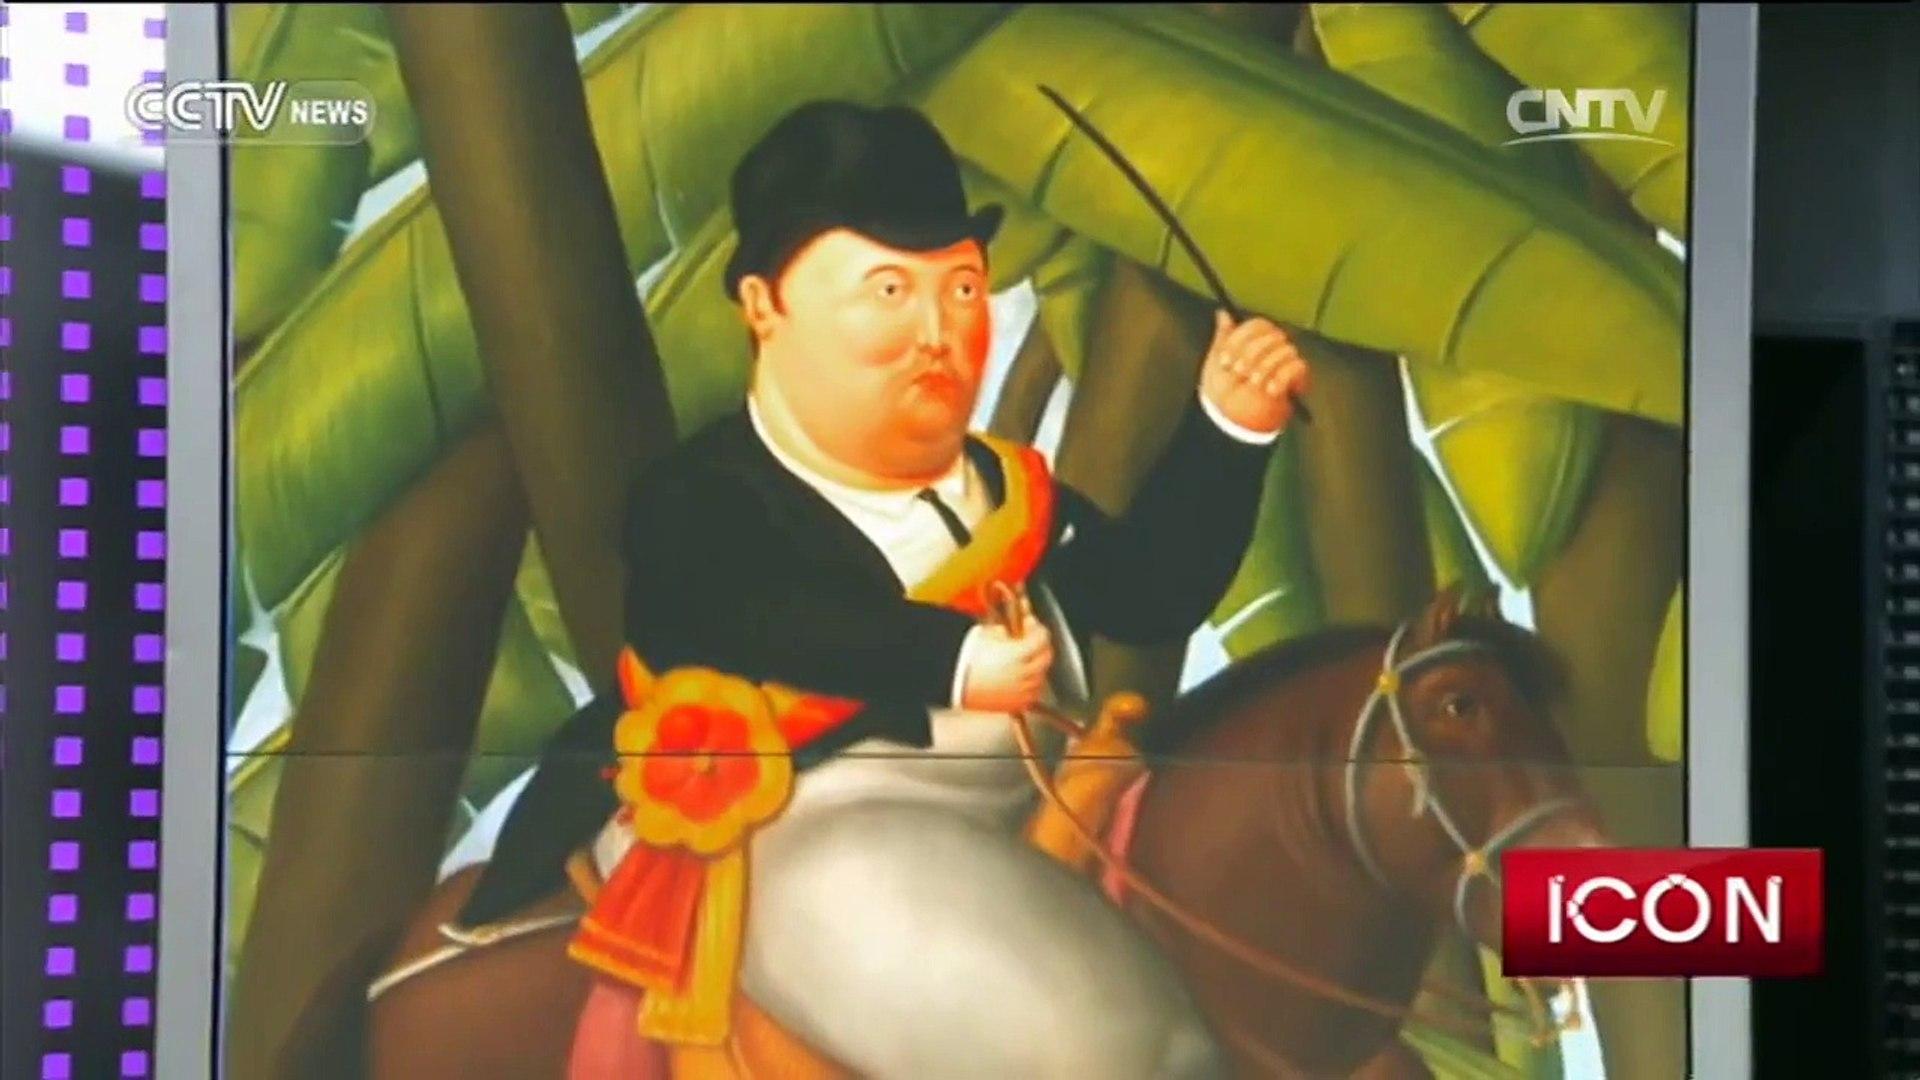 Icon— Fernando Botero, artist 08/13/2016